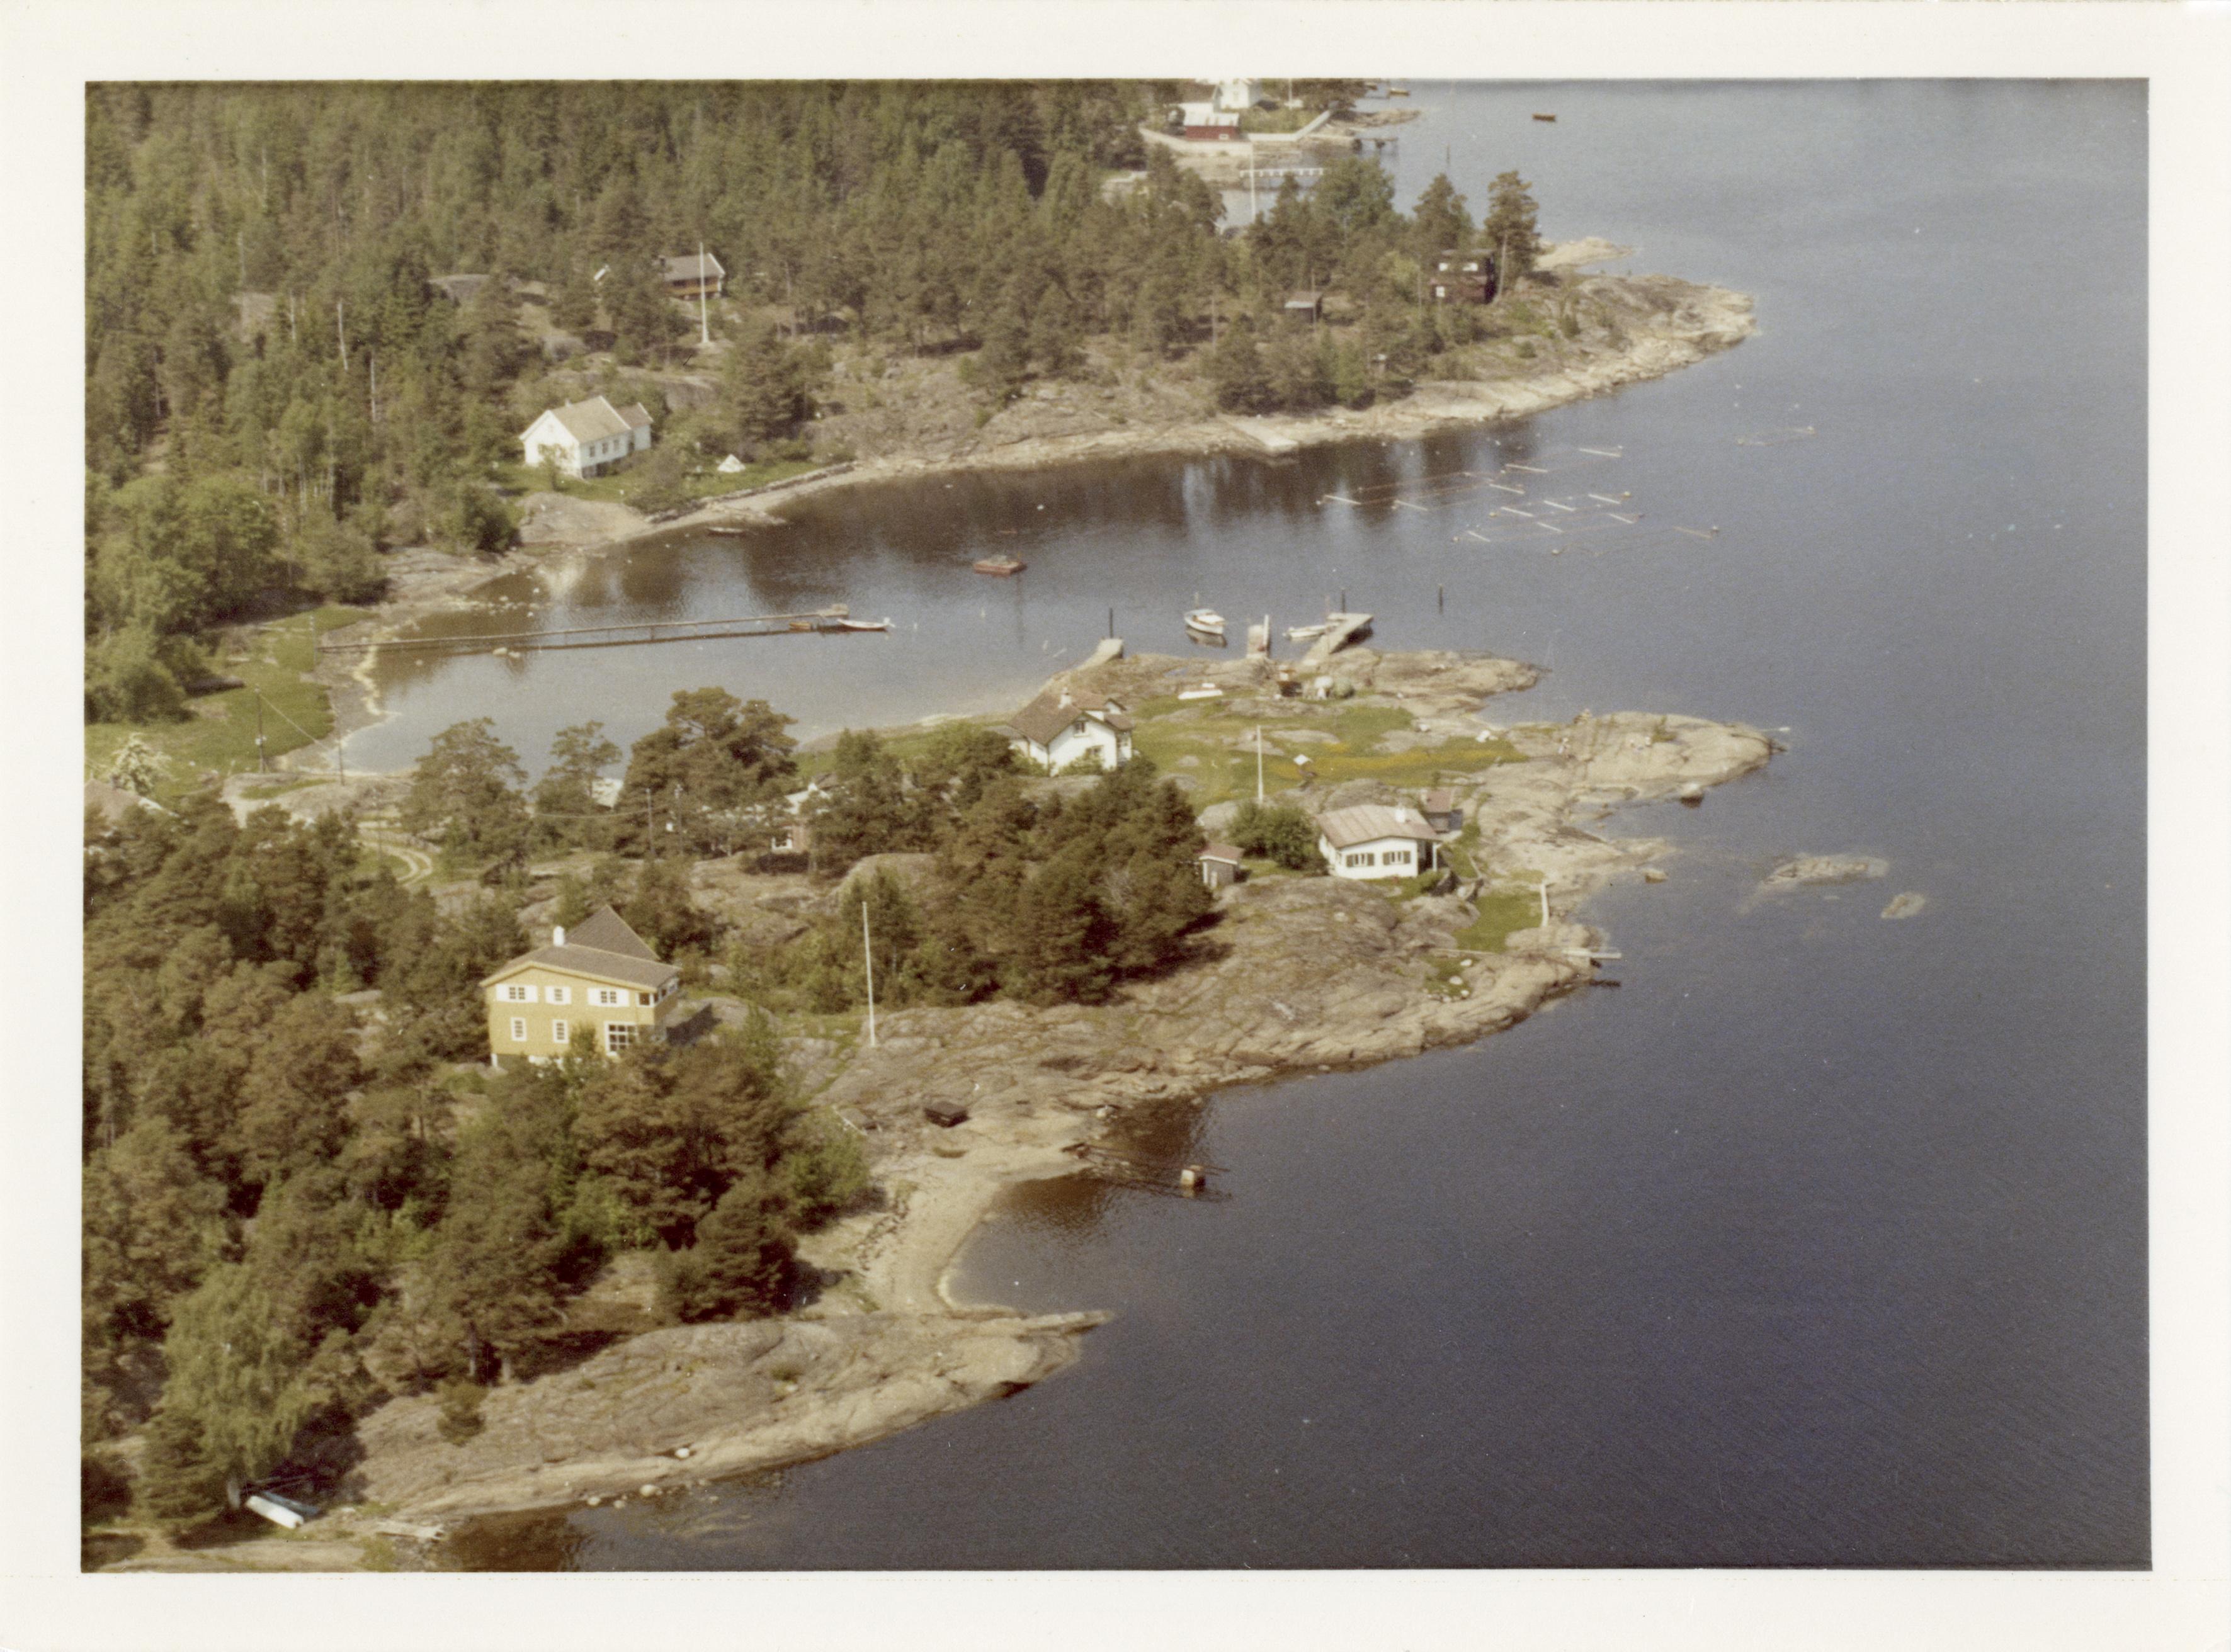 årøysund dating norway)